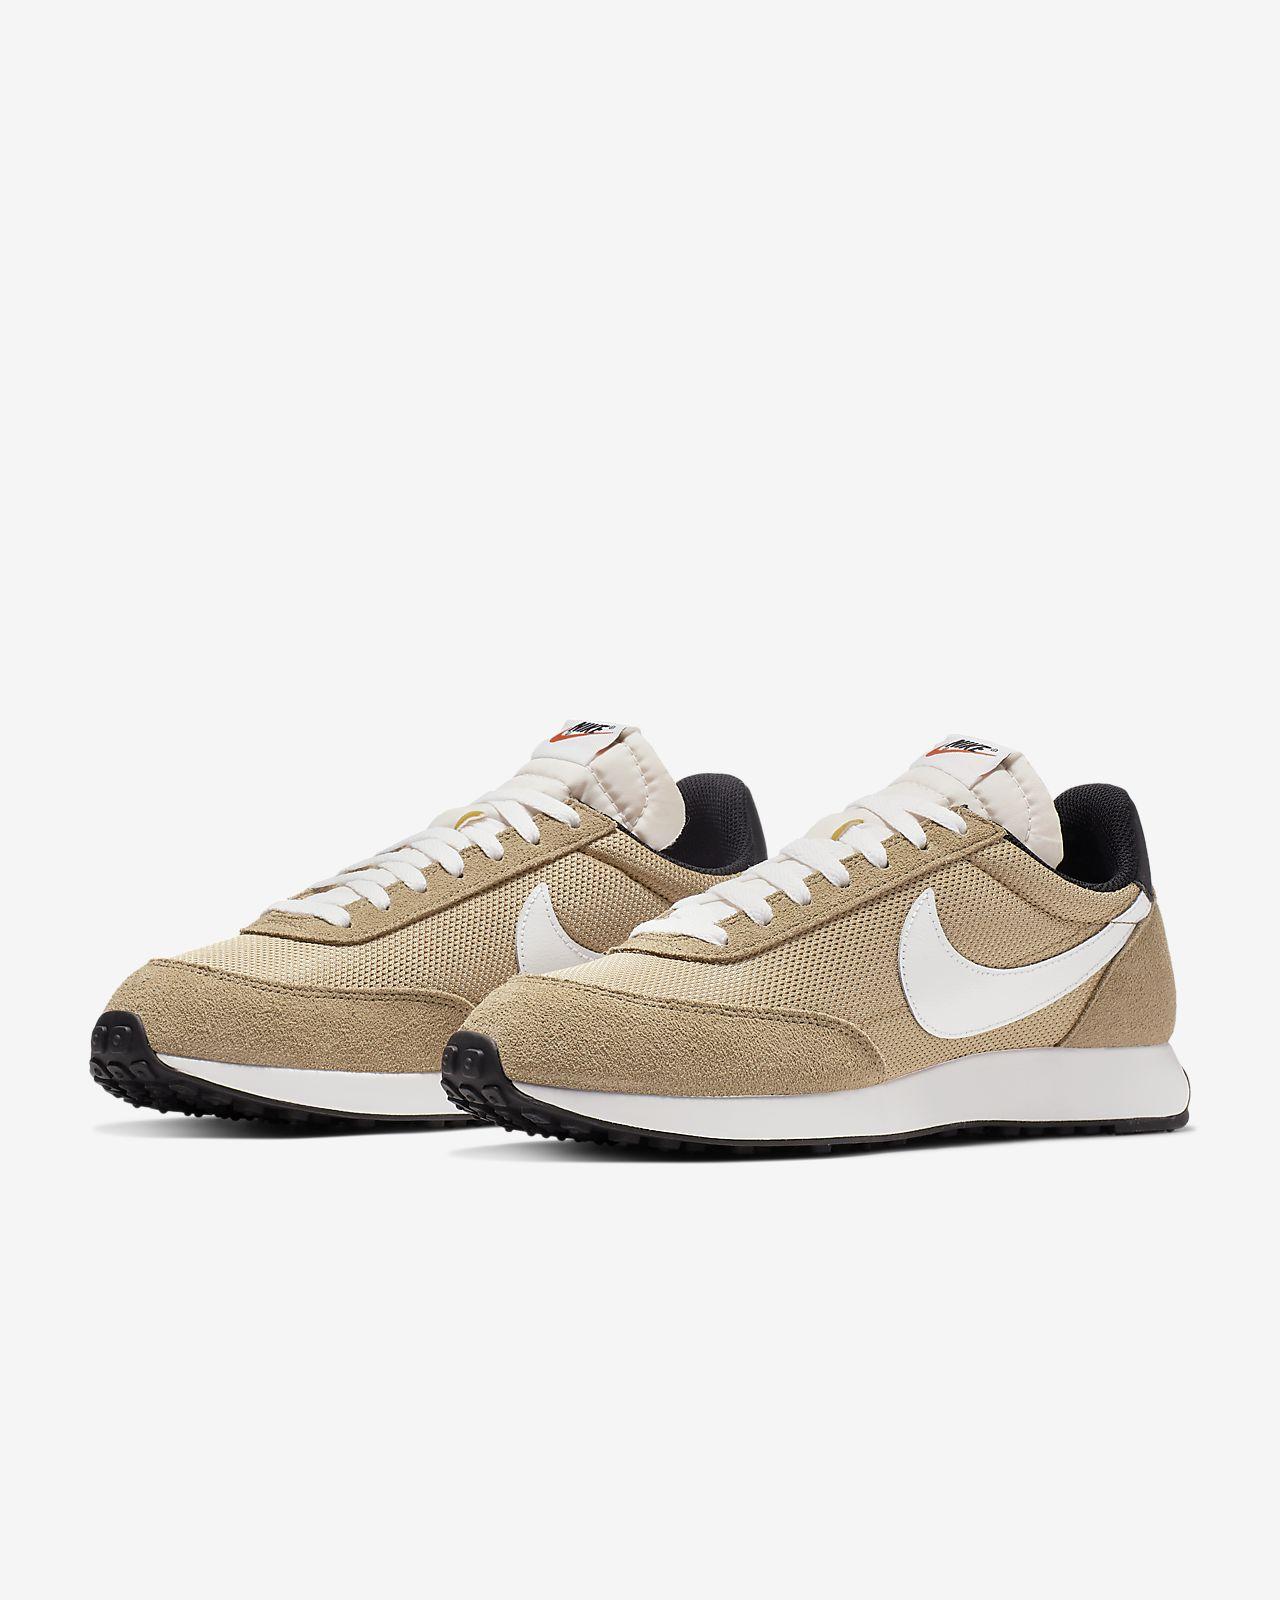 e9438a2a38 Nike Air Tailwind 79 Men's Shoe. Nike.com